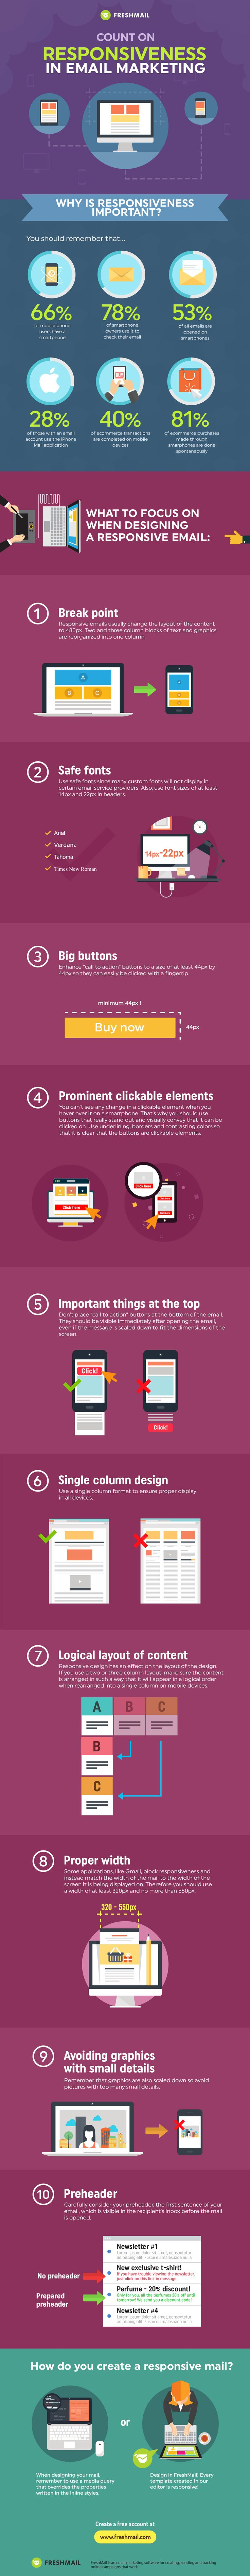 Make responsive emails